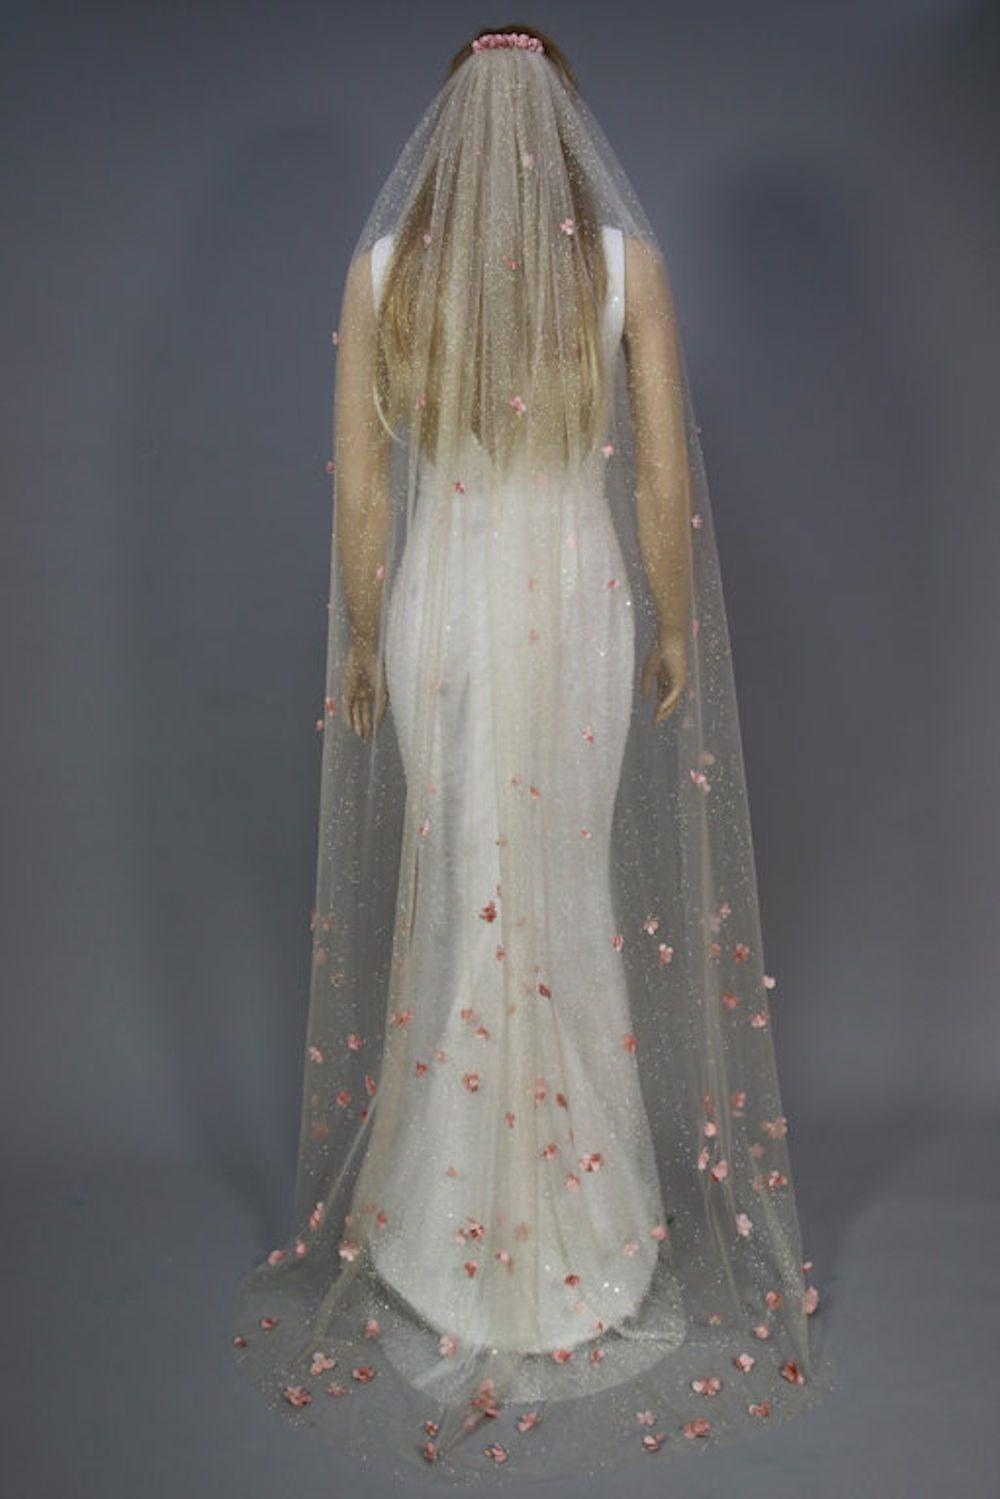 Orla - Bridal Veils Melbourne